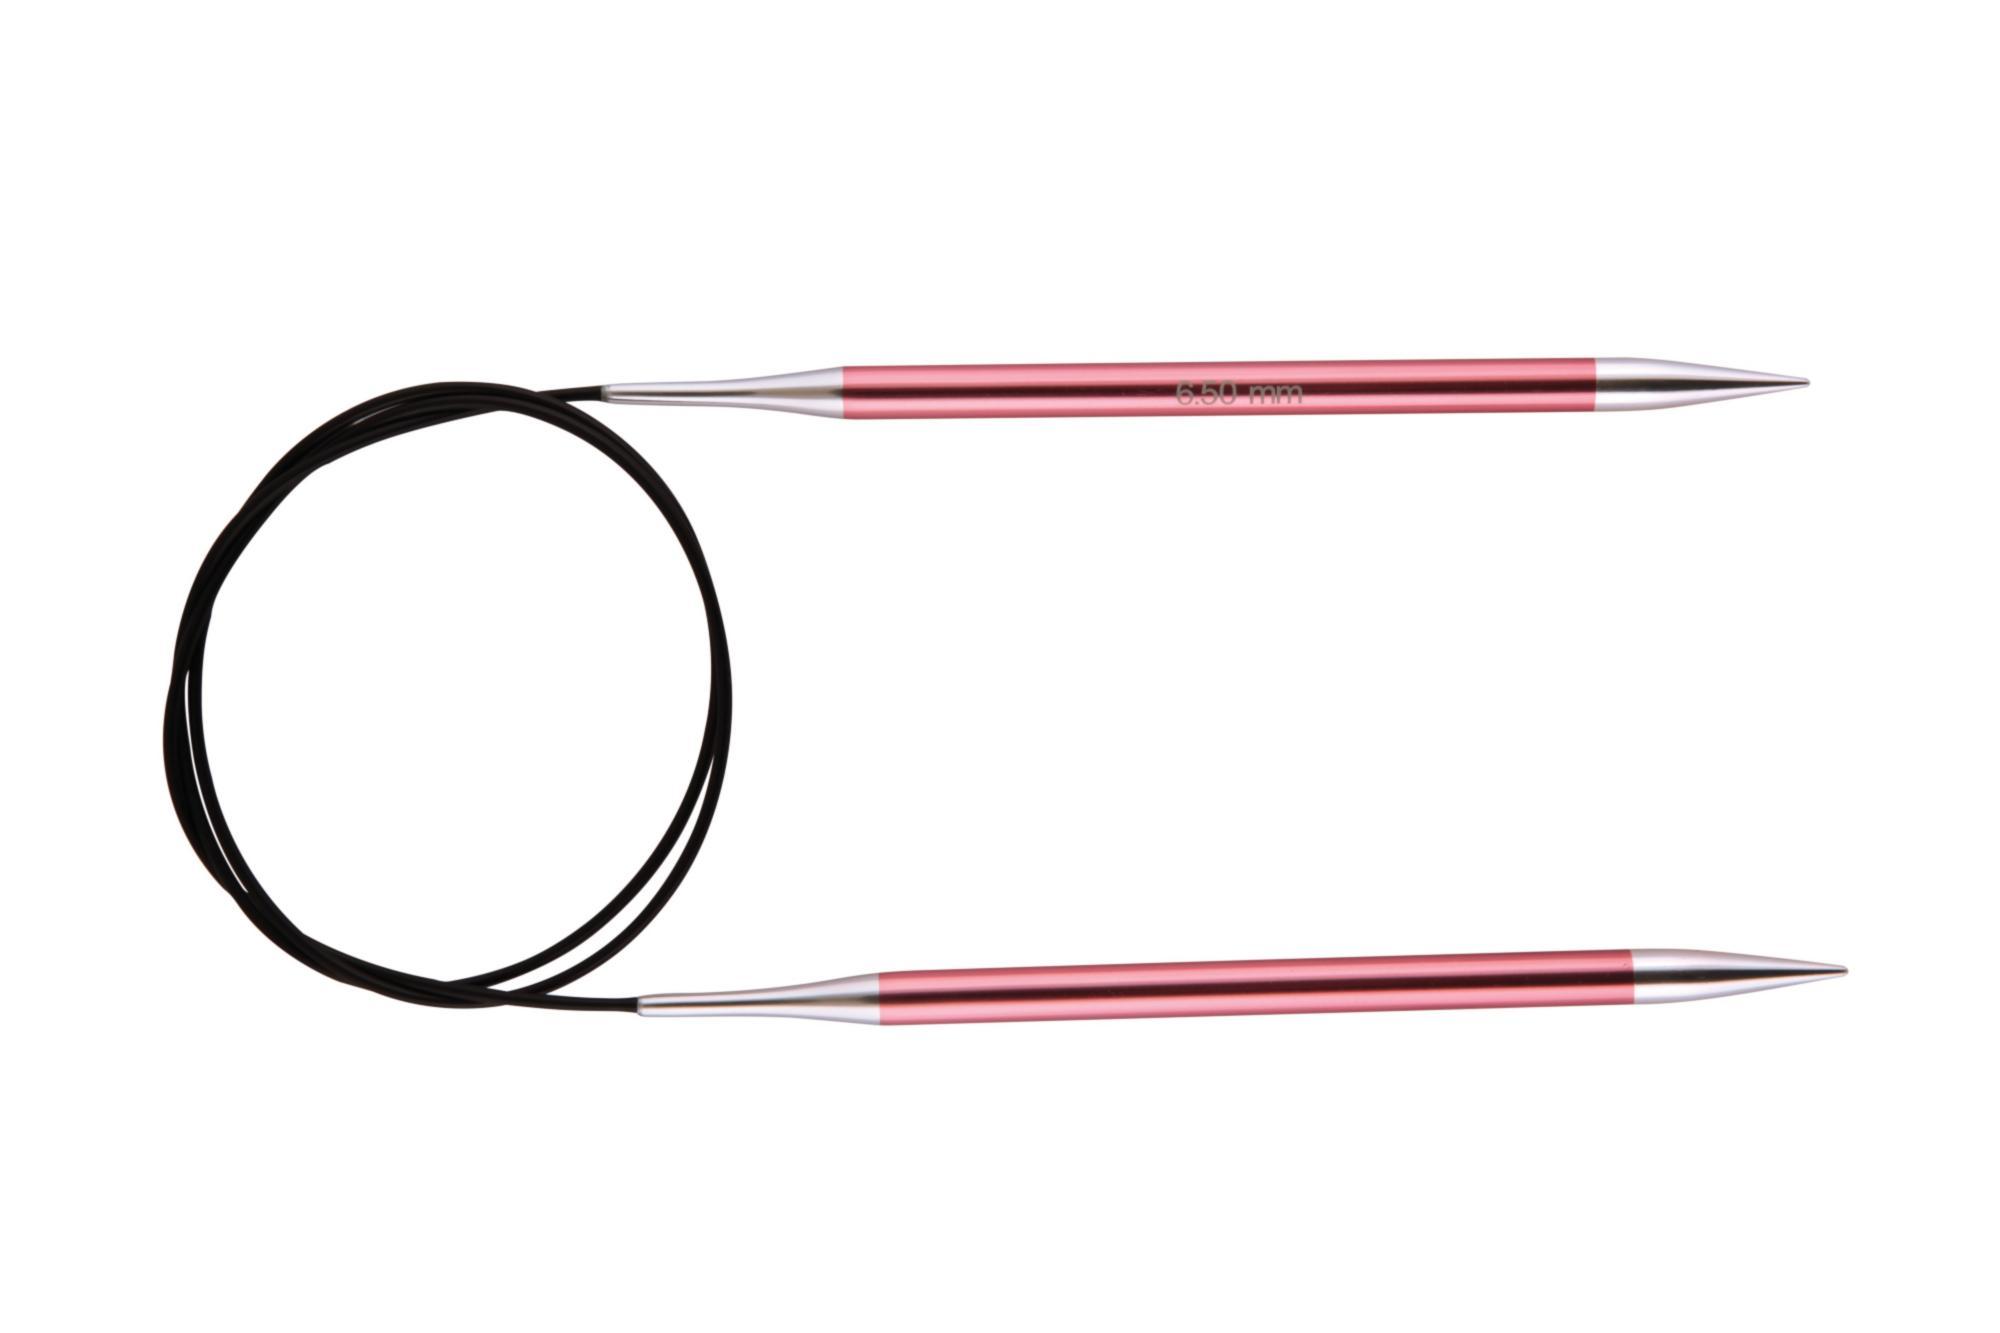 Спицы круговые 100 см Zing KnitPro, 47164, 6.50 мм